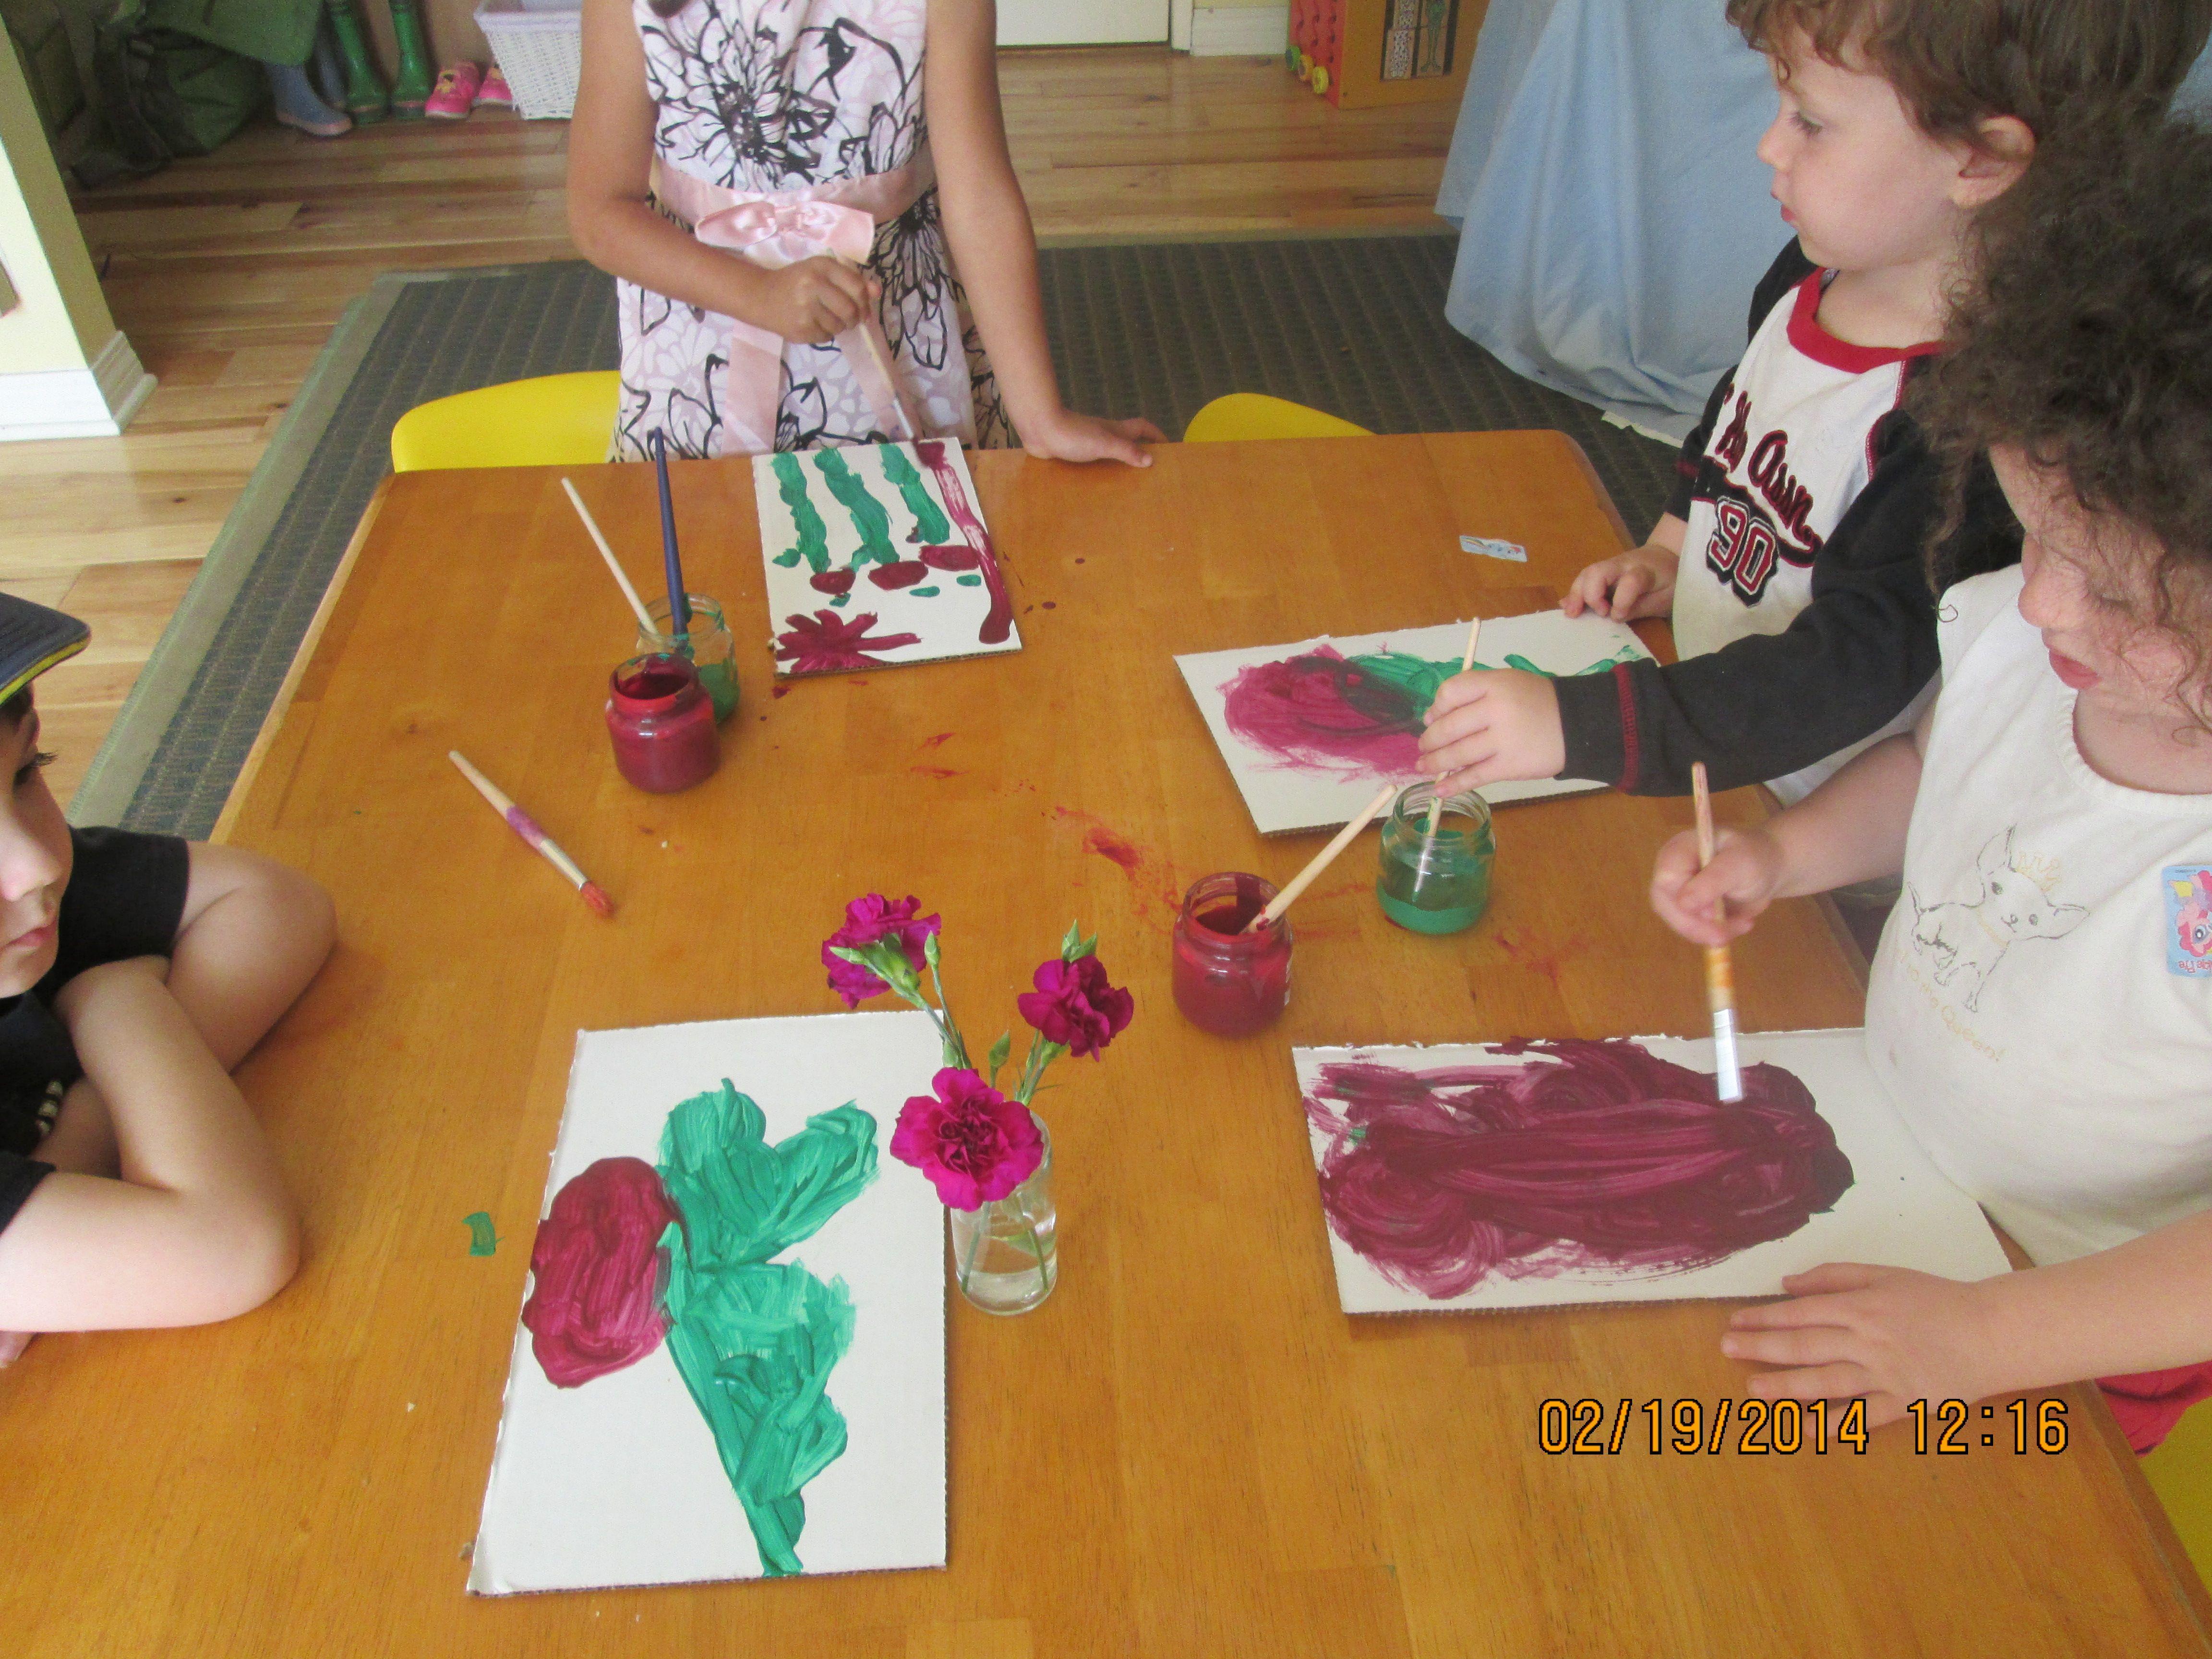 Painting flowers with preschoolers.